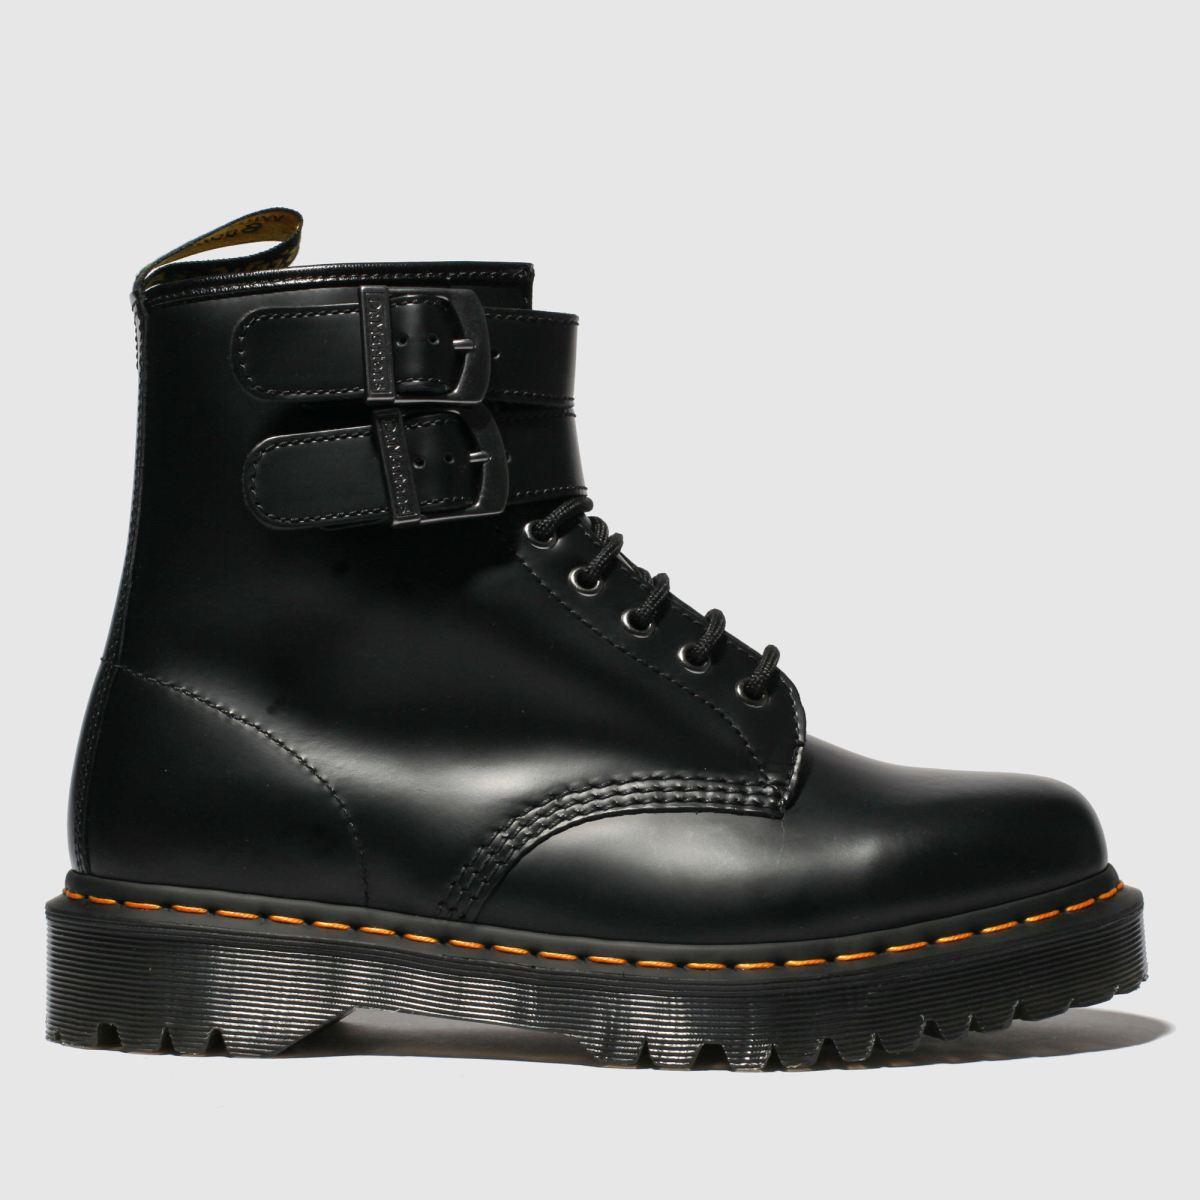 Dr Martens Black 1460 Alt Boots